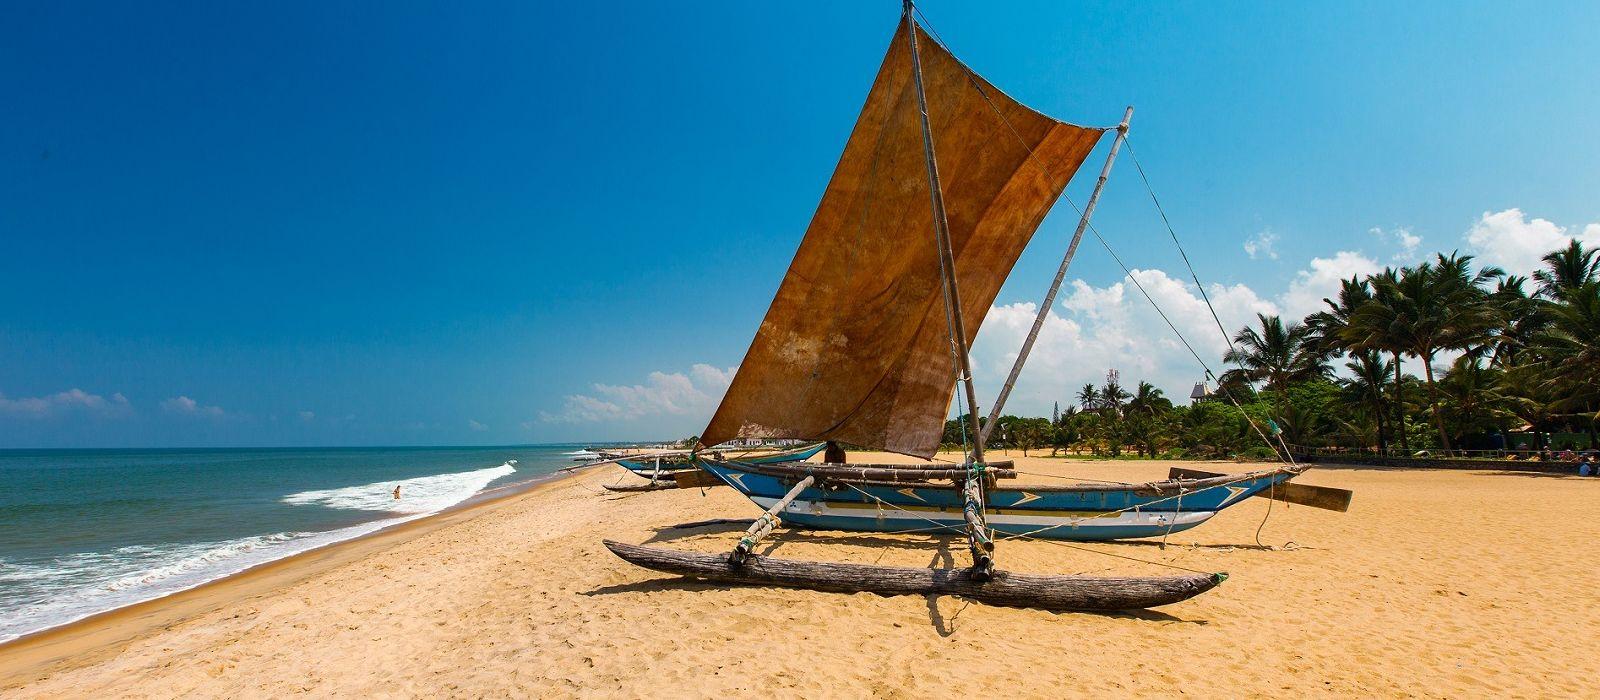 Sri Lanka: Reise zur Heimat des berühmten Ceylon-Tees Urlaub 2